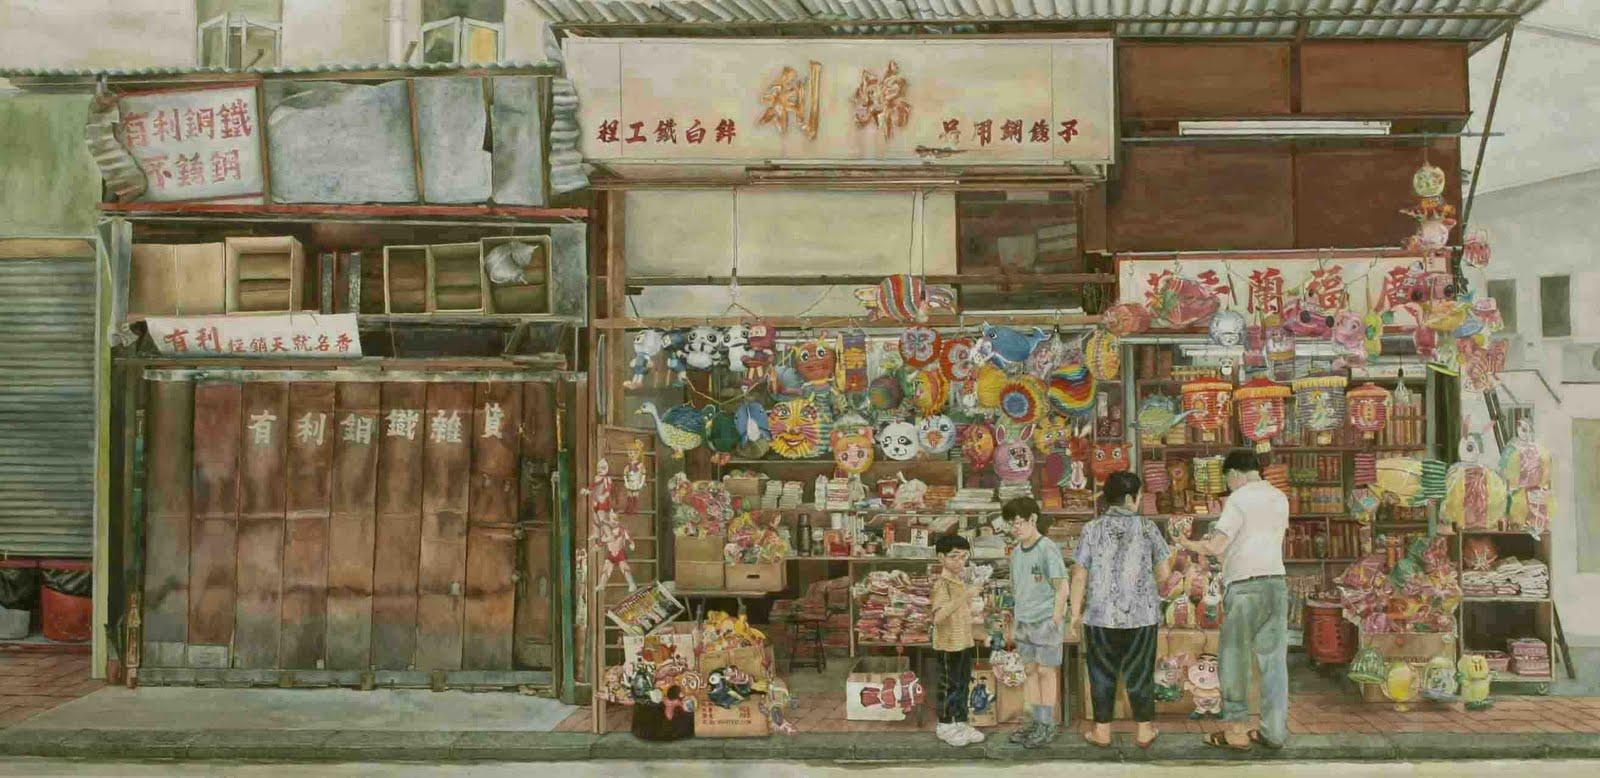 My favorite lantern - cleverly street, hong kong